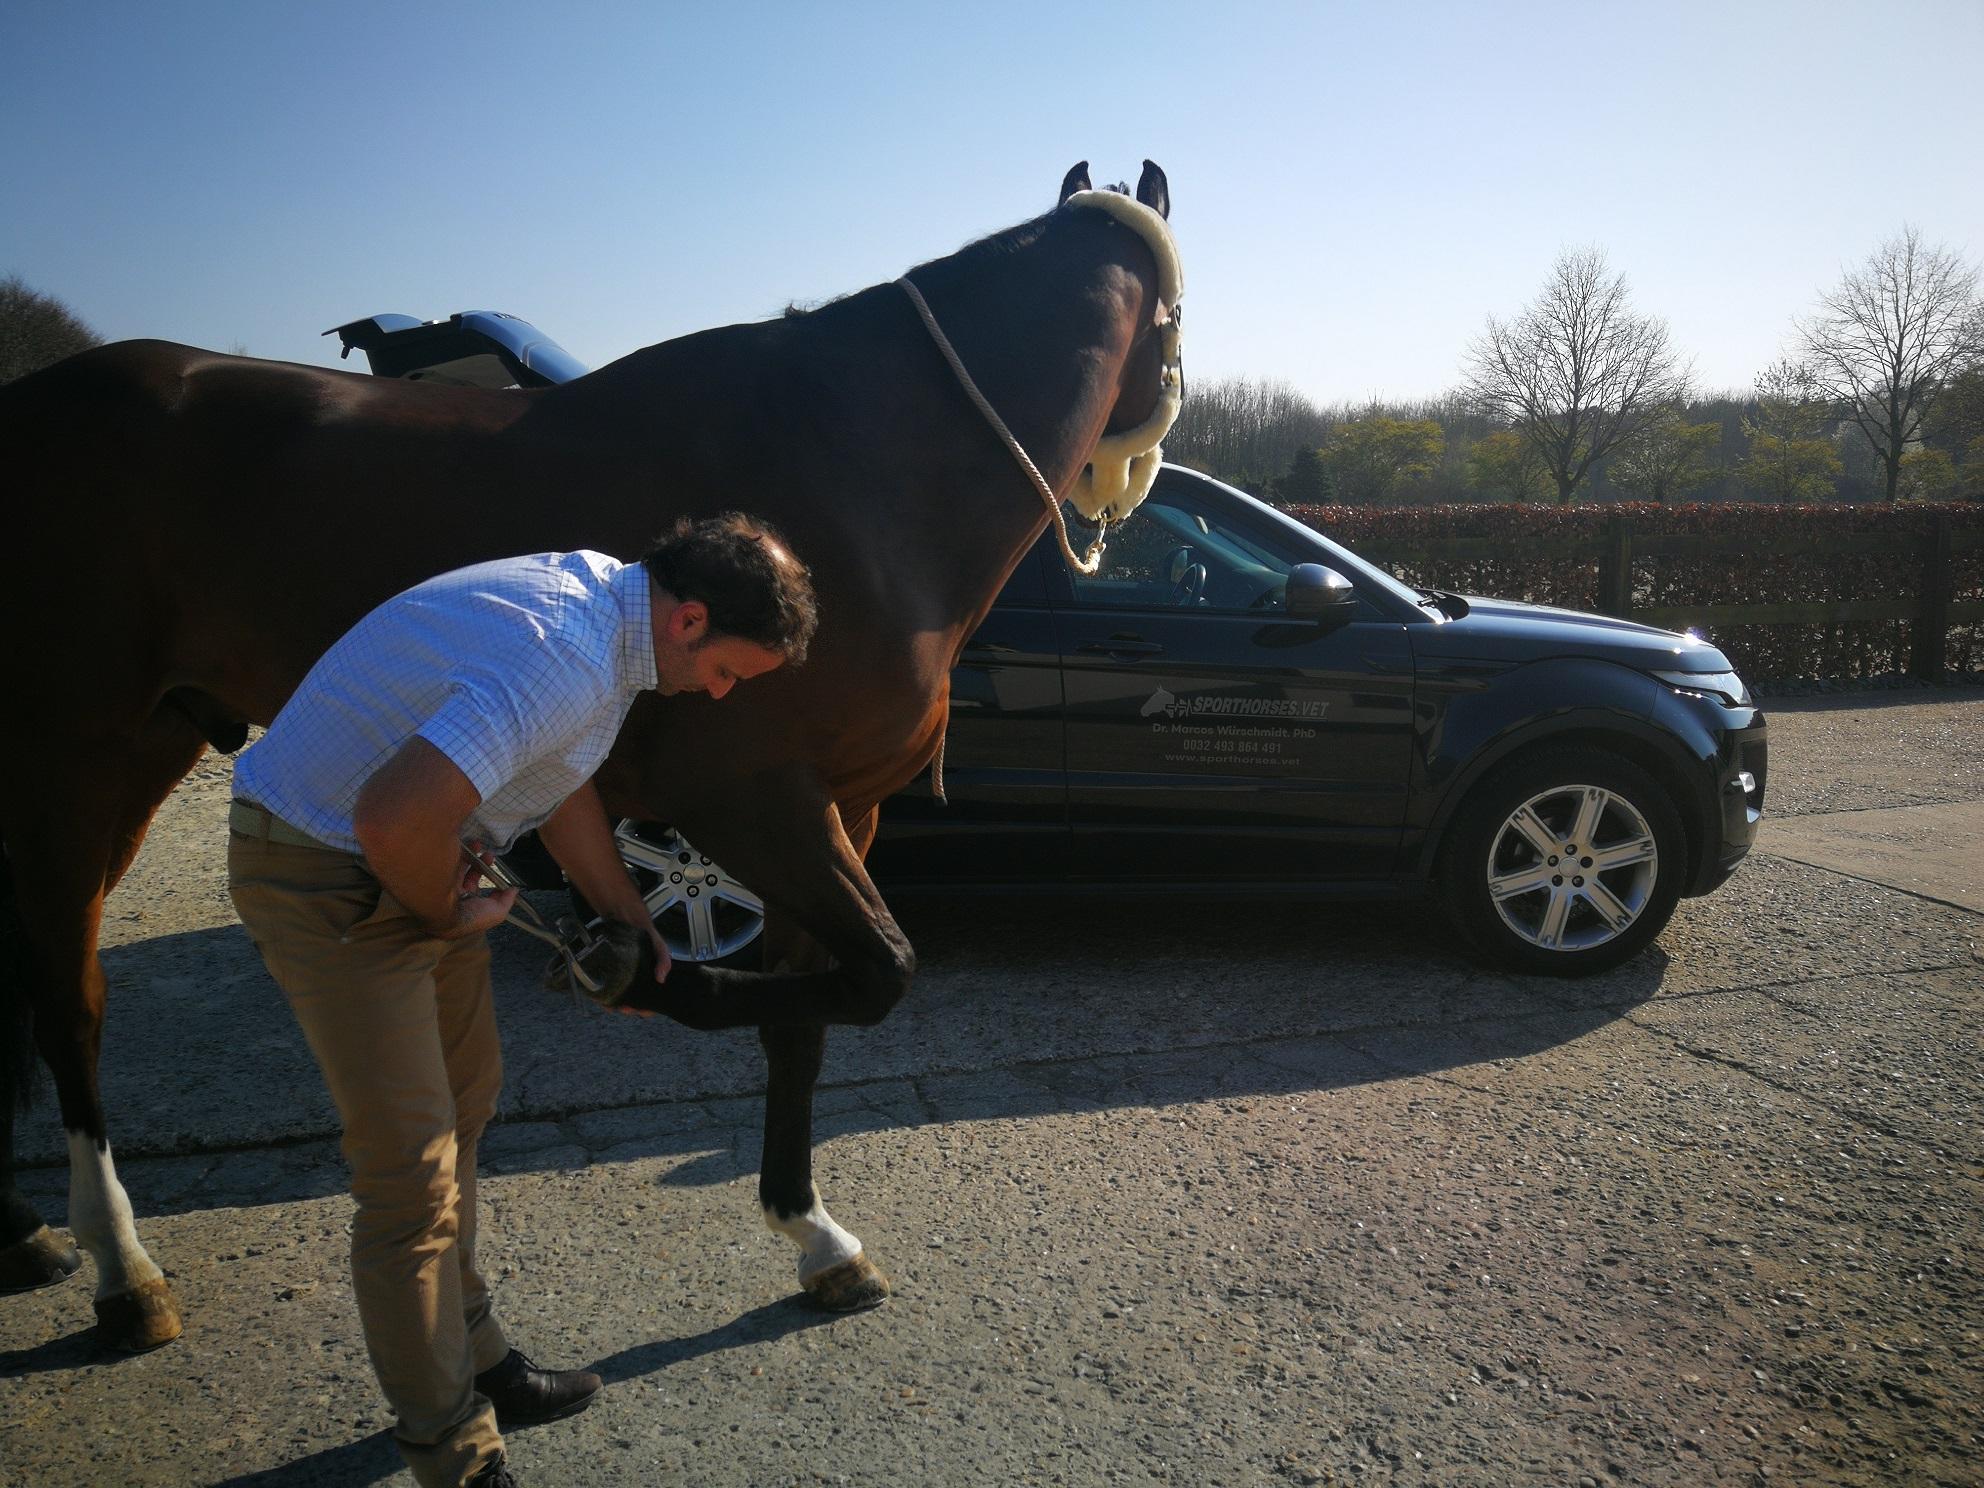 Horses prepurchase exam - clinical examination